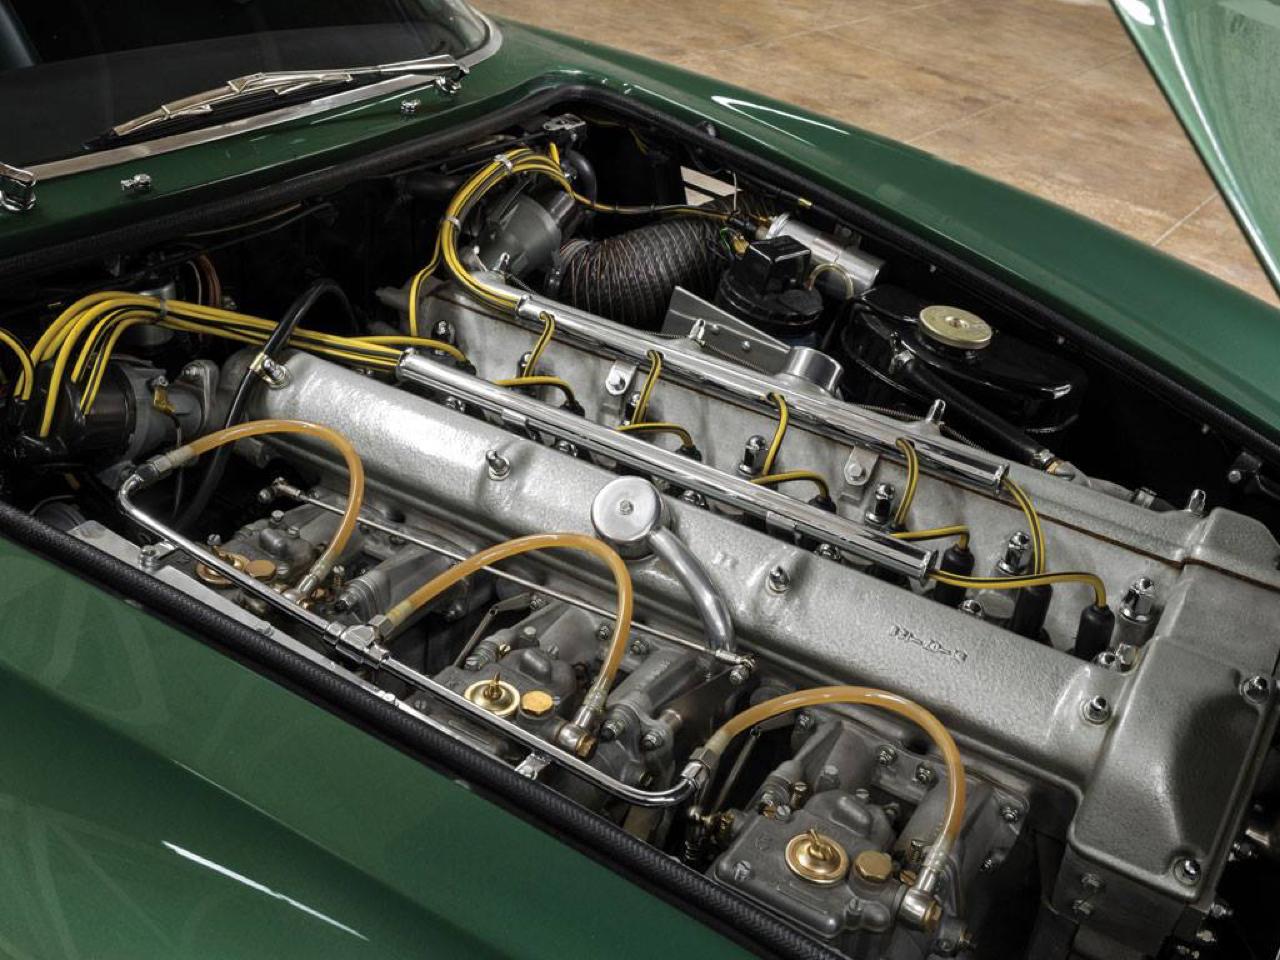 Aston Martin DB4 GT Zagato - Mangeuse de Ferrari ! 6